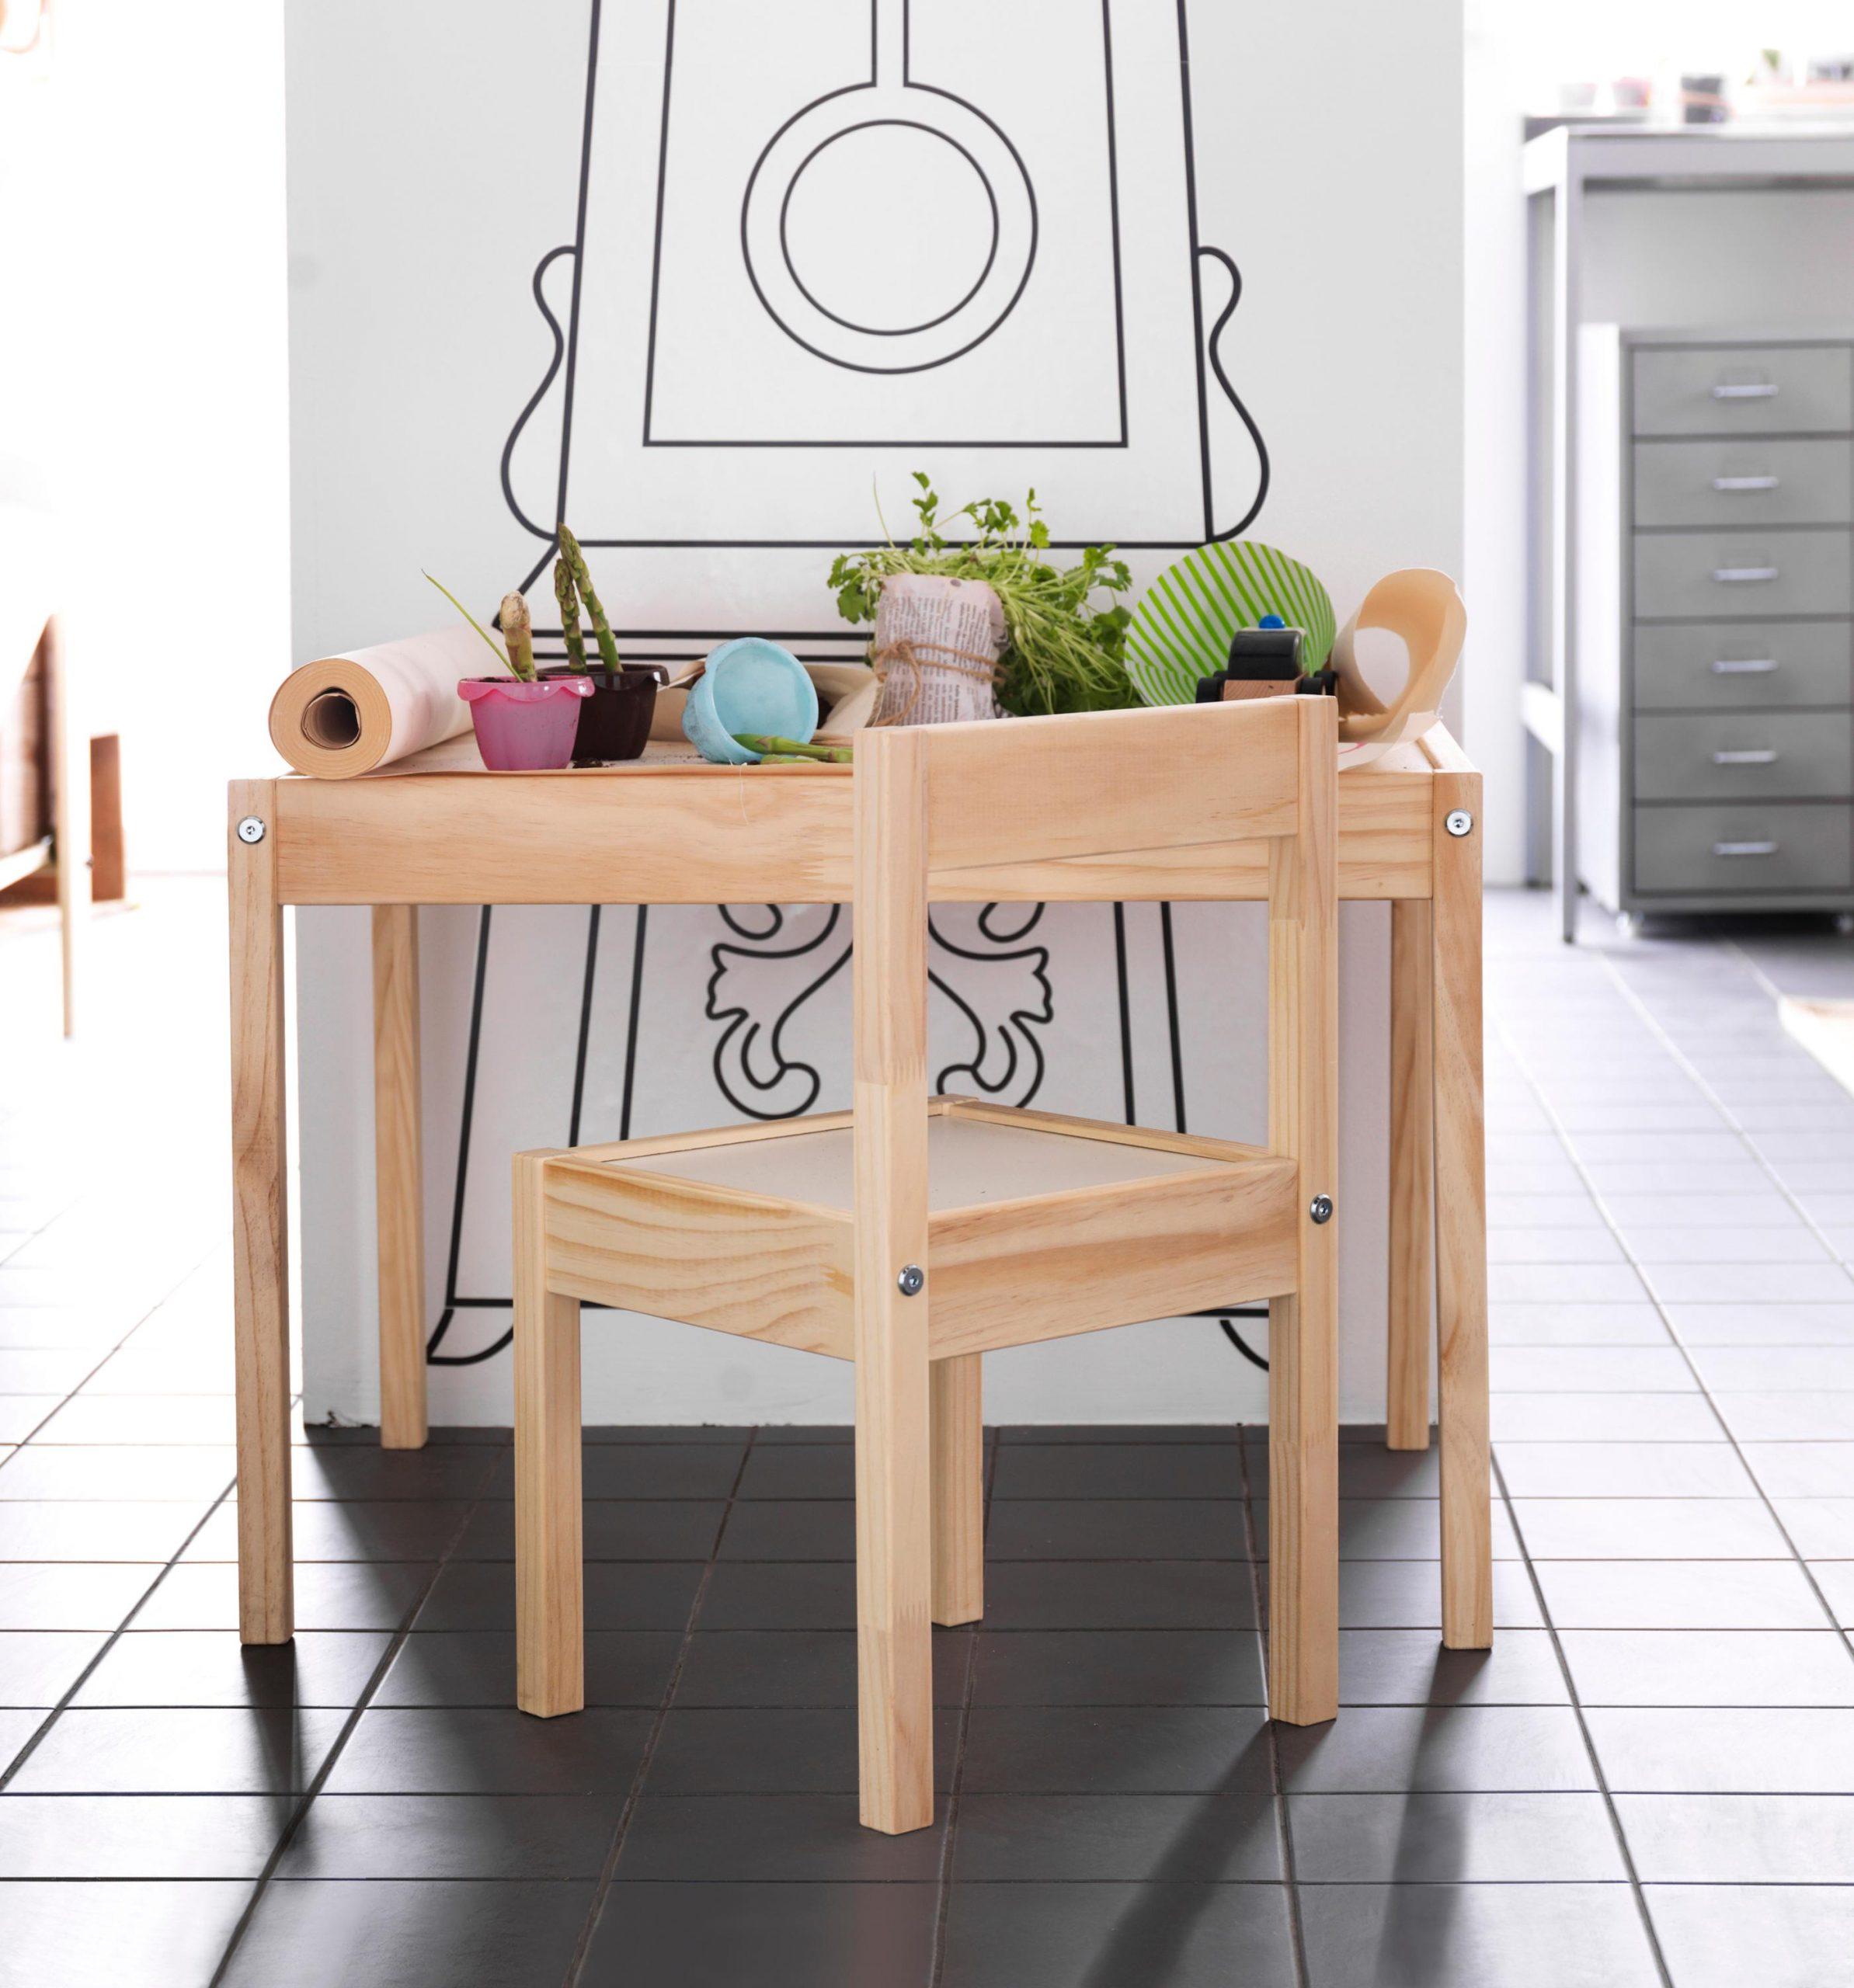 Singlekuche Ikea Minikuche Mit Geschirrspuler Kuchen Edelstahl